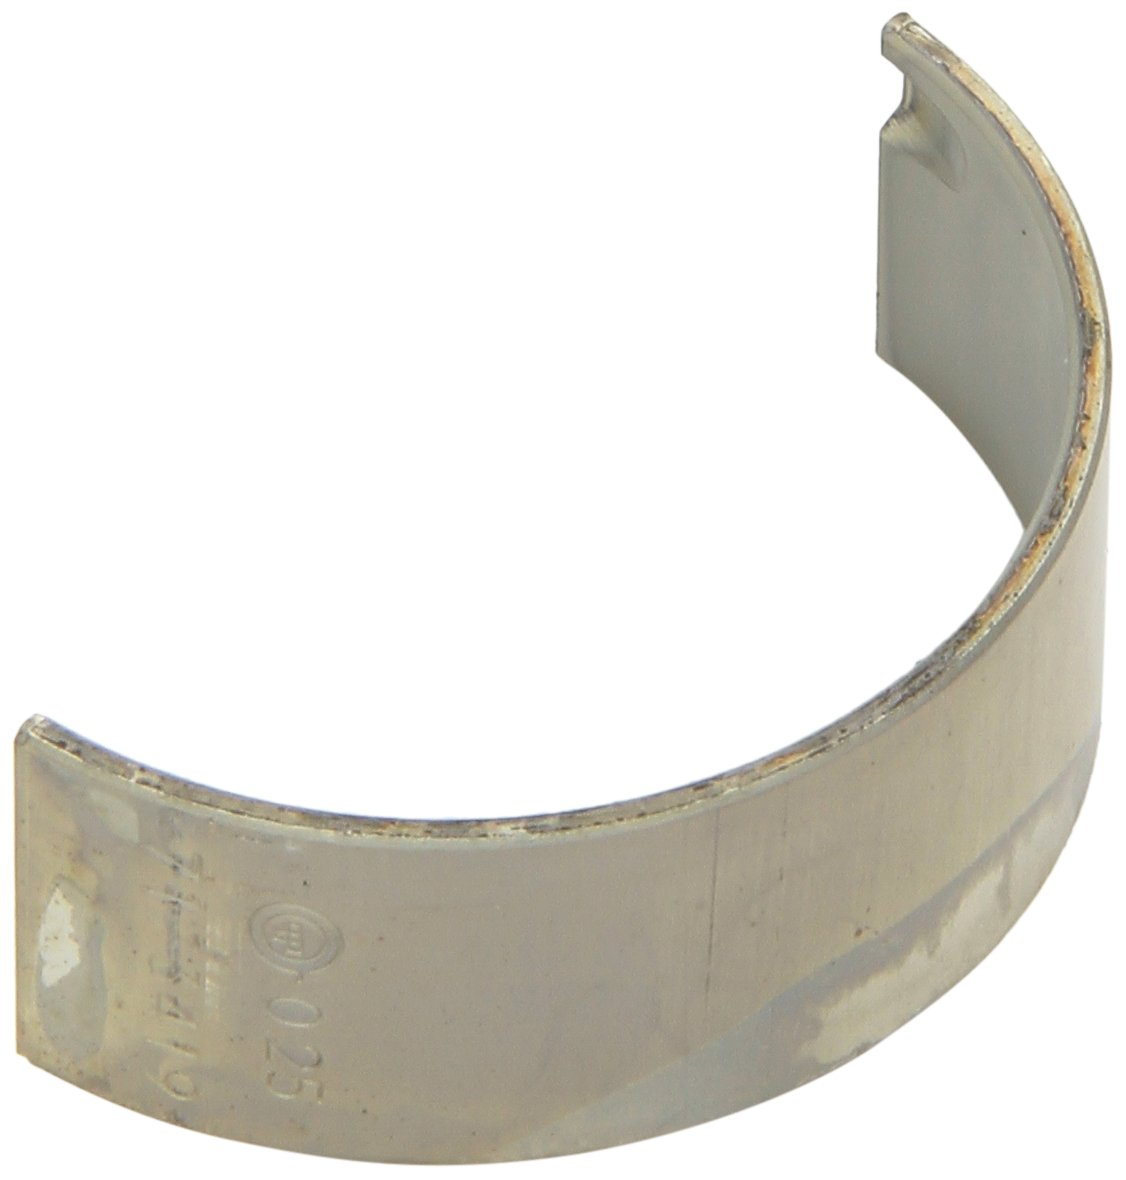 Glyco 71-3419/4 0.25mm Big End Bearings Federal Mogul